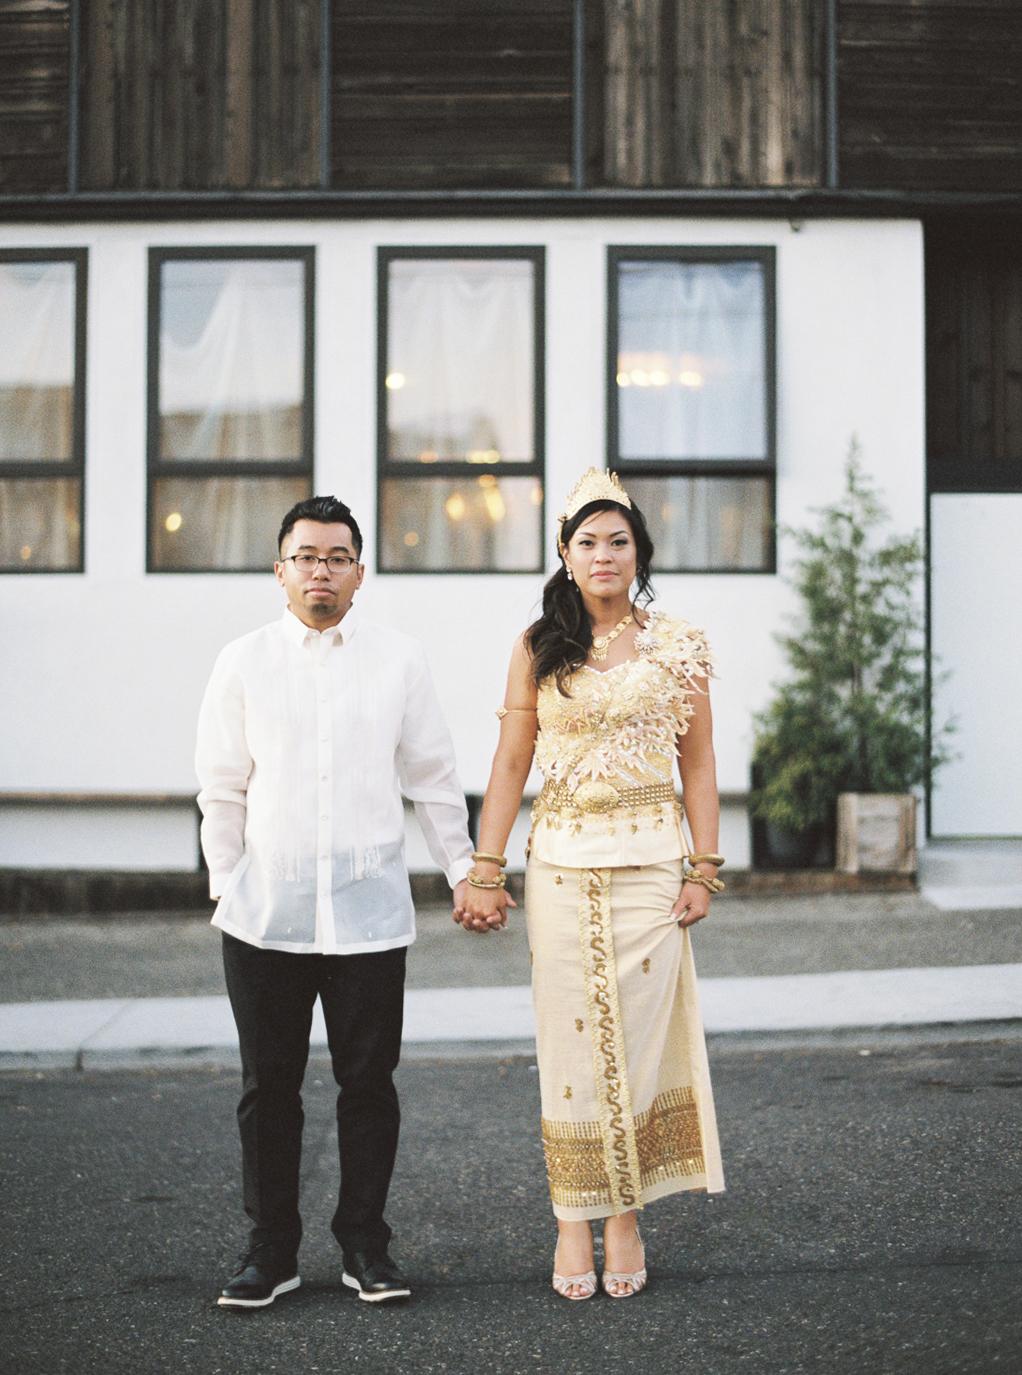 HIP INTIMATE LOCAL WEDDING • UNION PINE • PORTLAND, OR